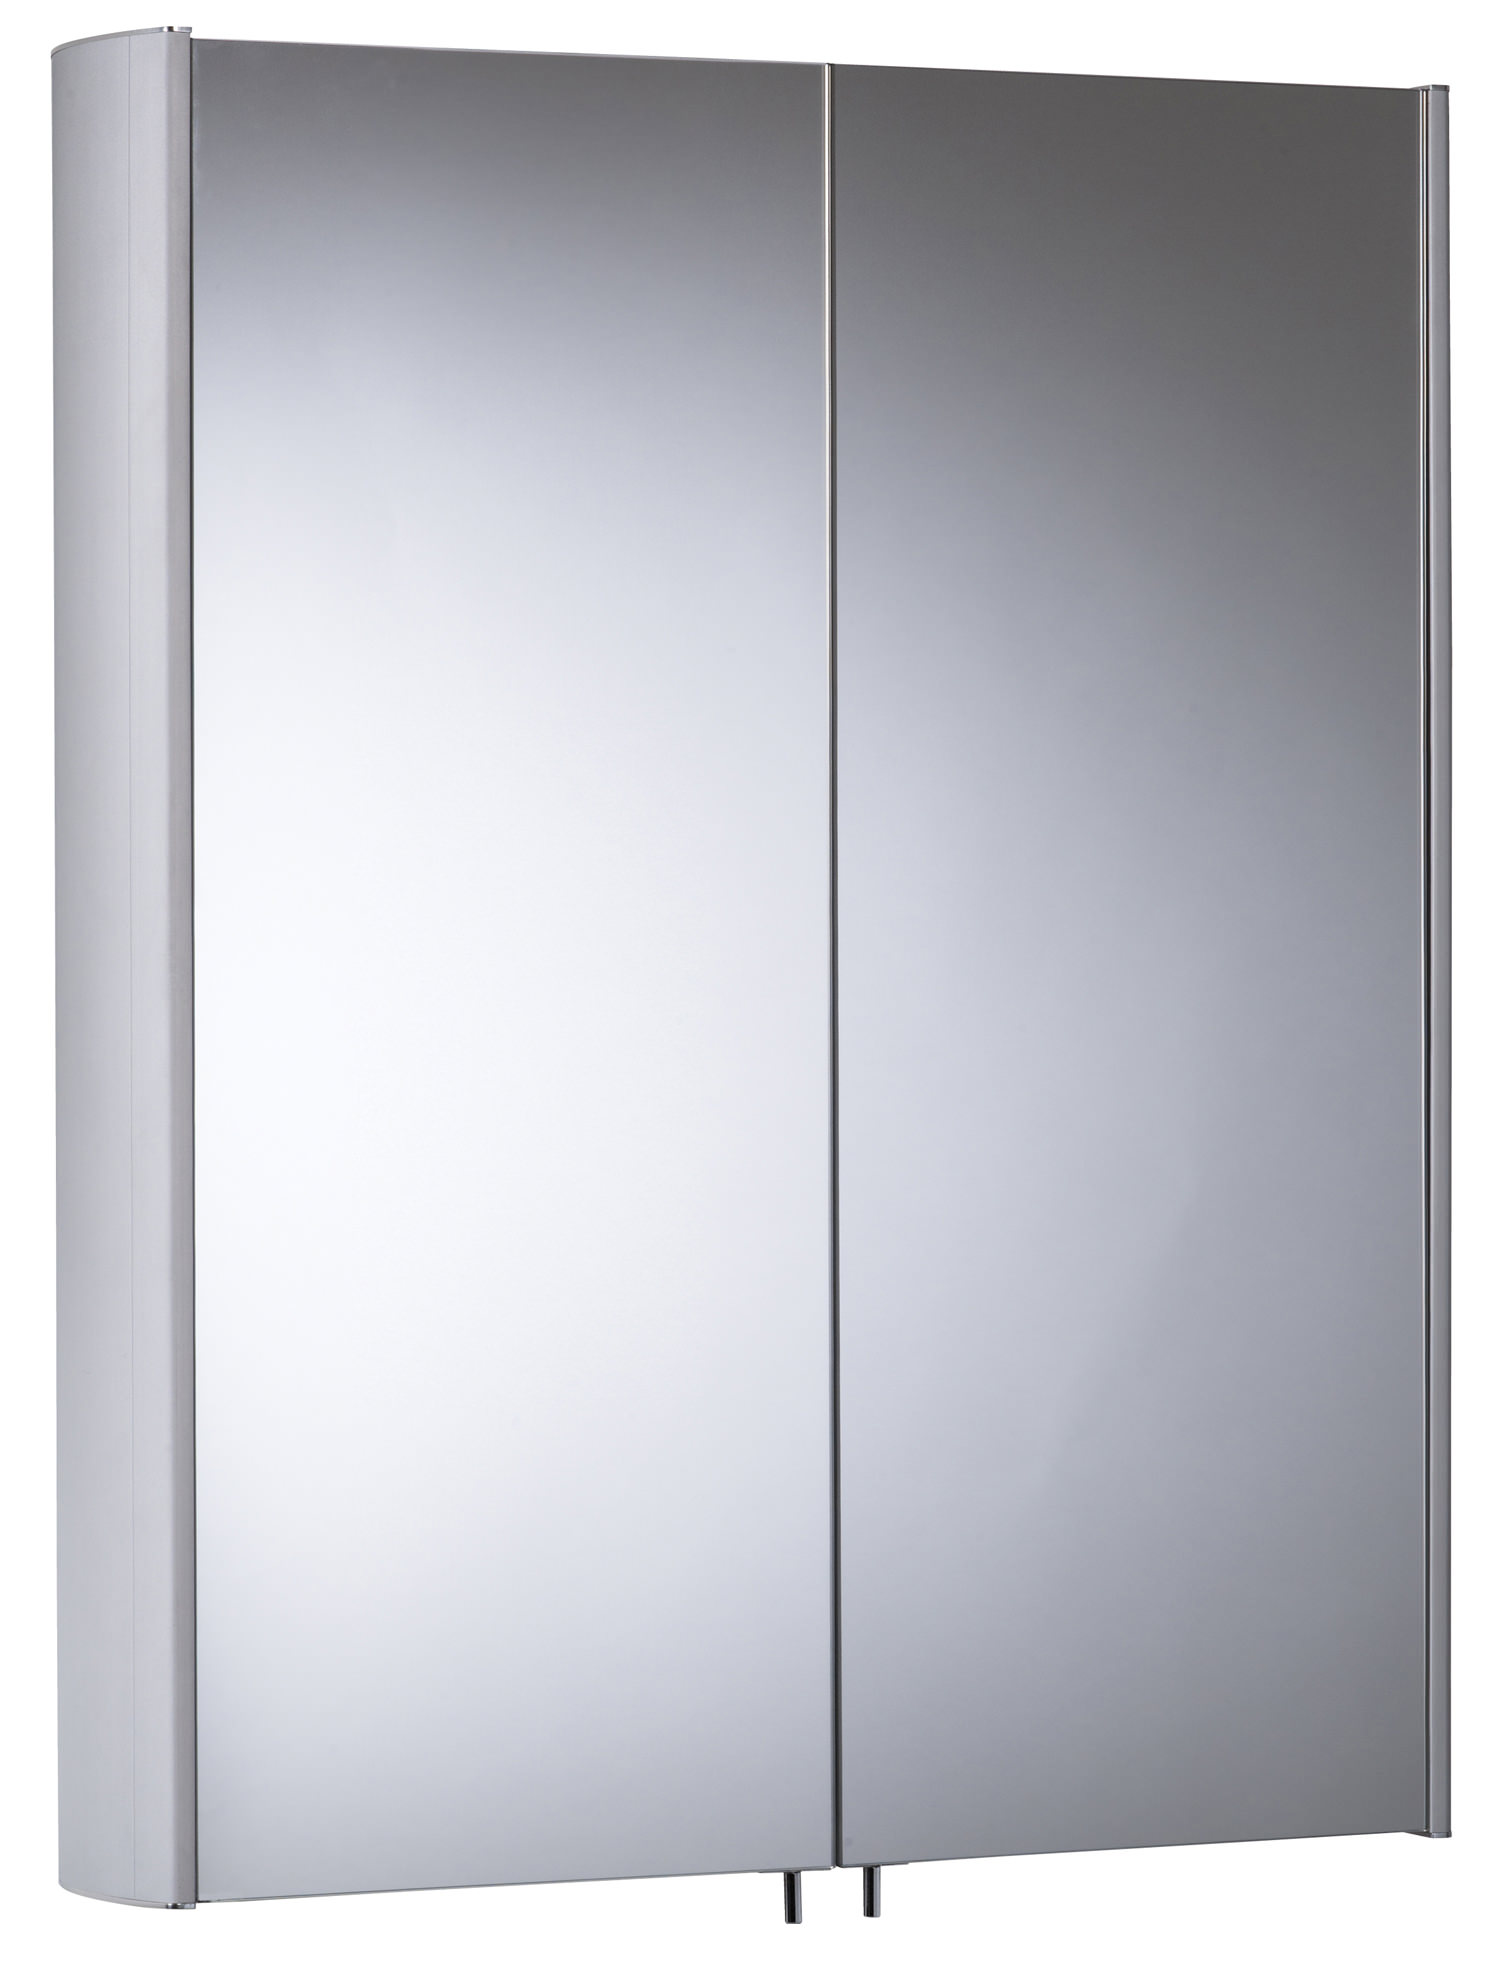 Tavistock Move 580mm Double Mirror Doors Aluminium Cabinet